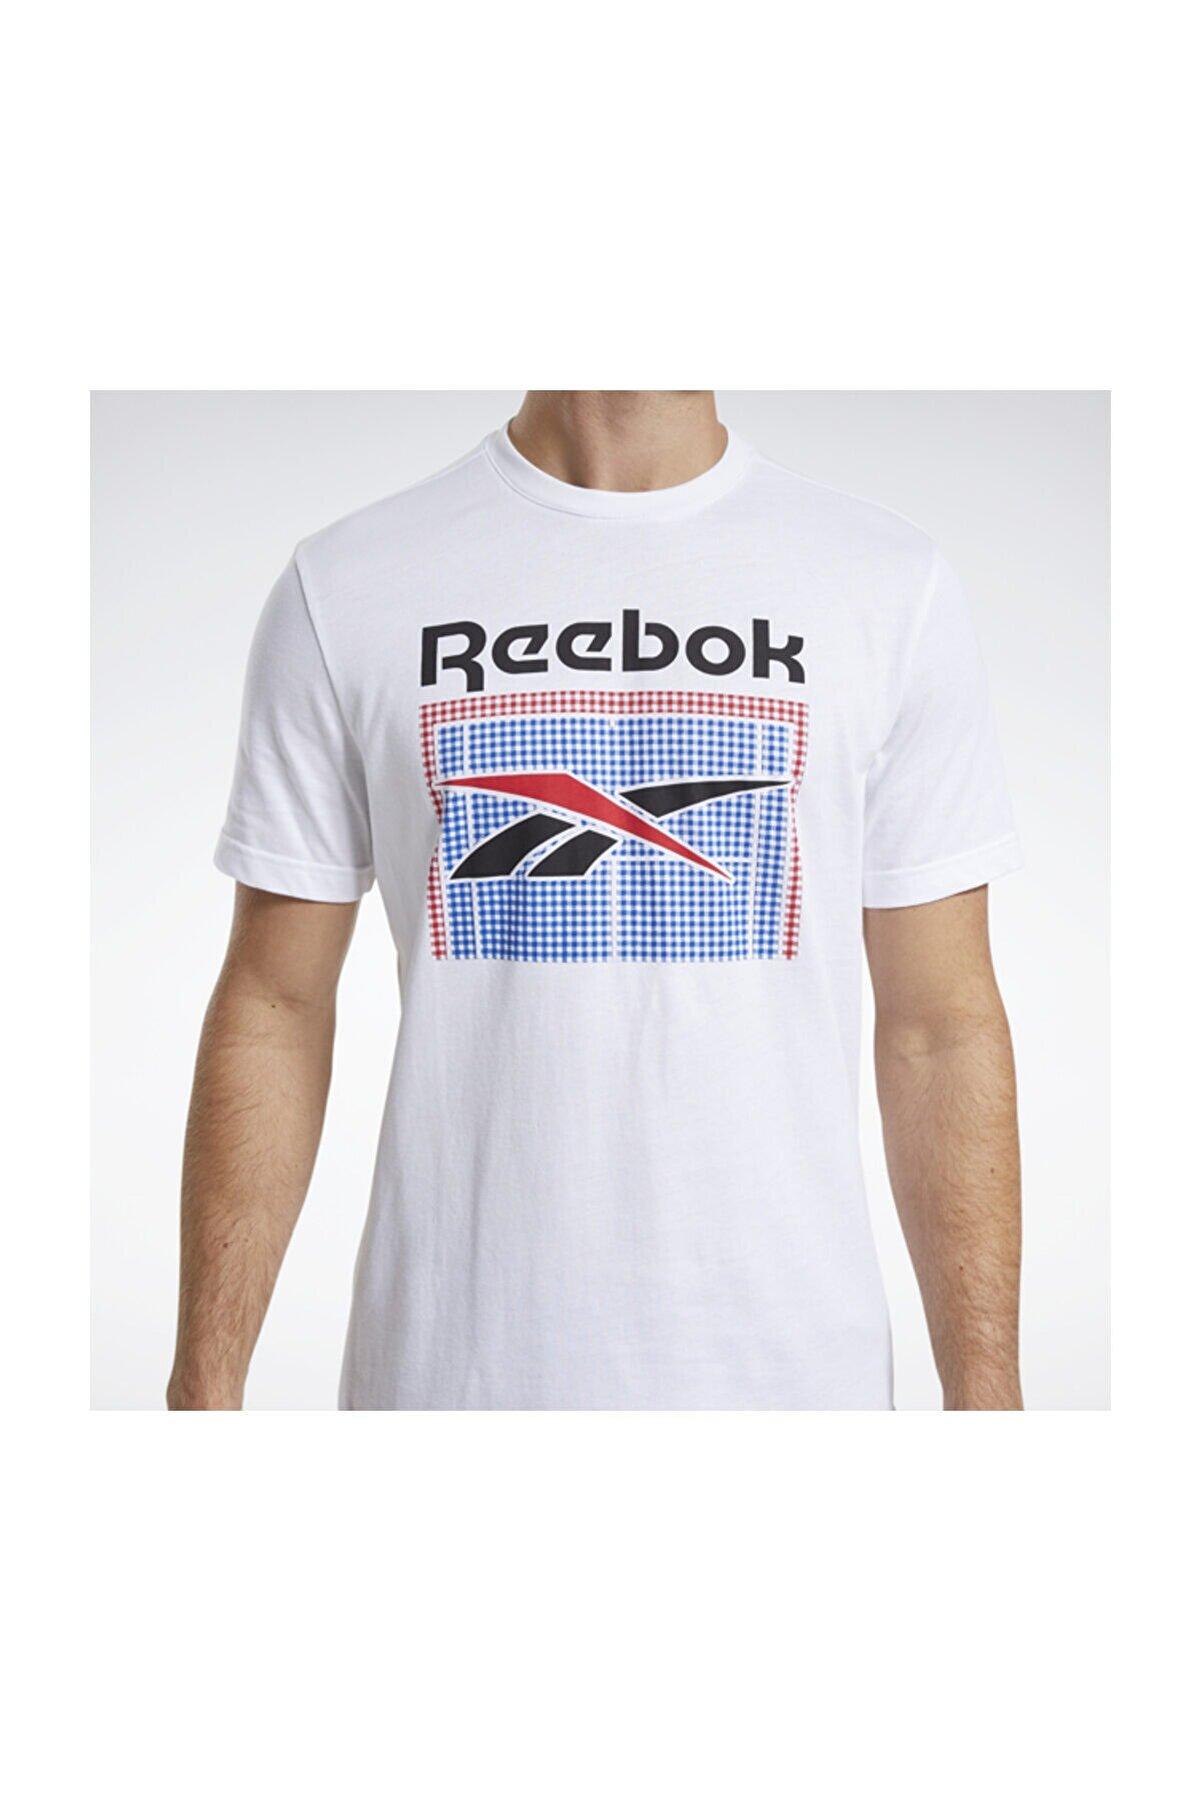 Reebok Unisex Yetişkin T-Shirt FT7411